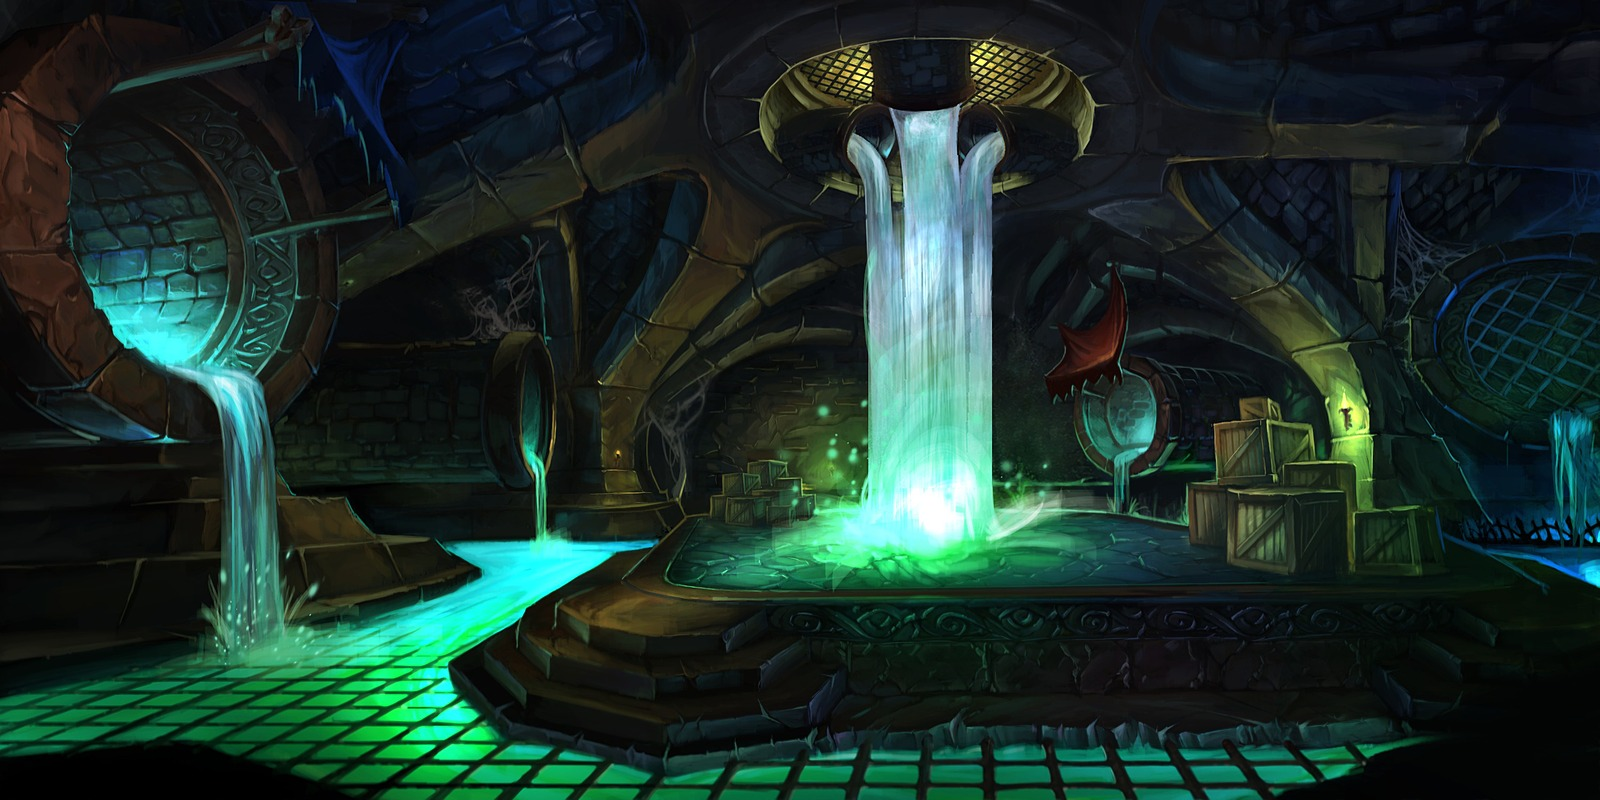 Un Flic, une Chauve-souris, un Monstre [Gordon] Loadscreen-dalaran-sewers-full